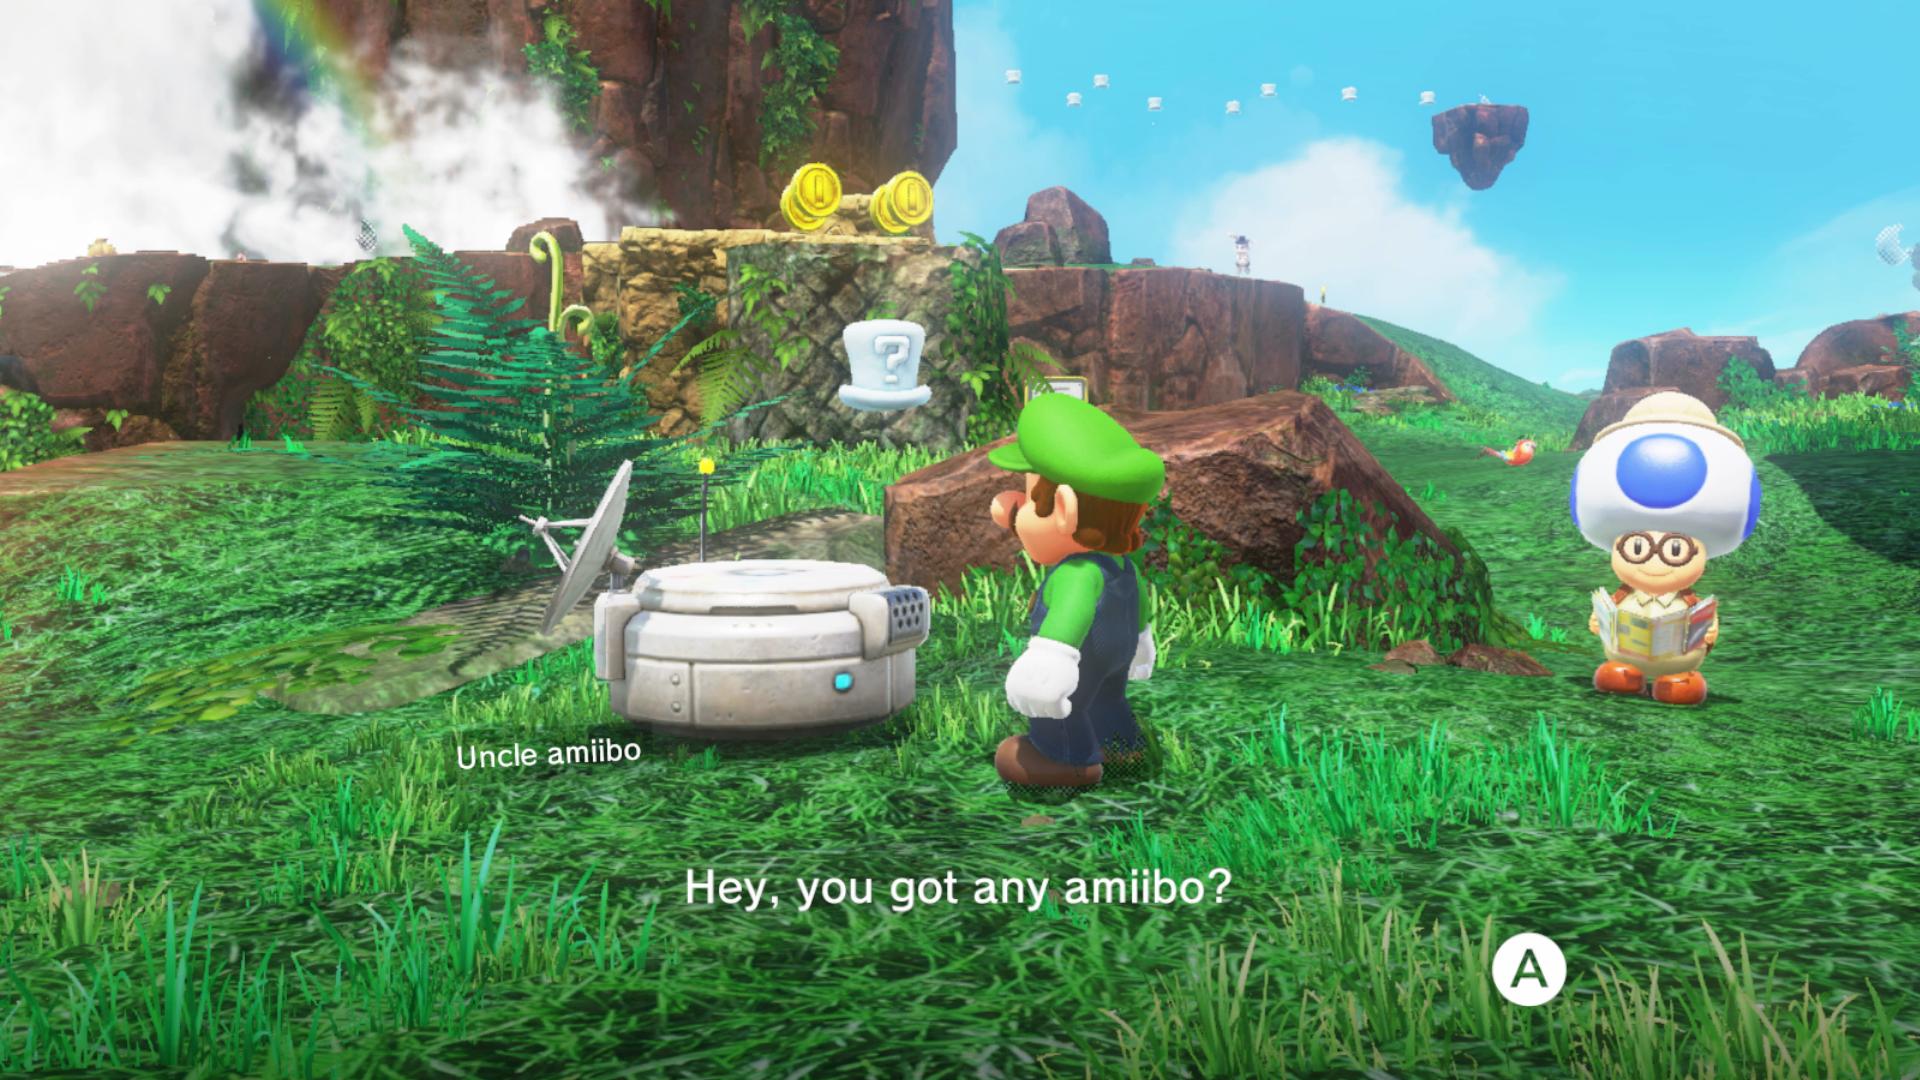 Super Mario Odyssey Amiibo Guide: What Your Amiibos Will Unlock